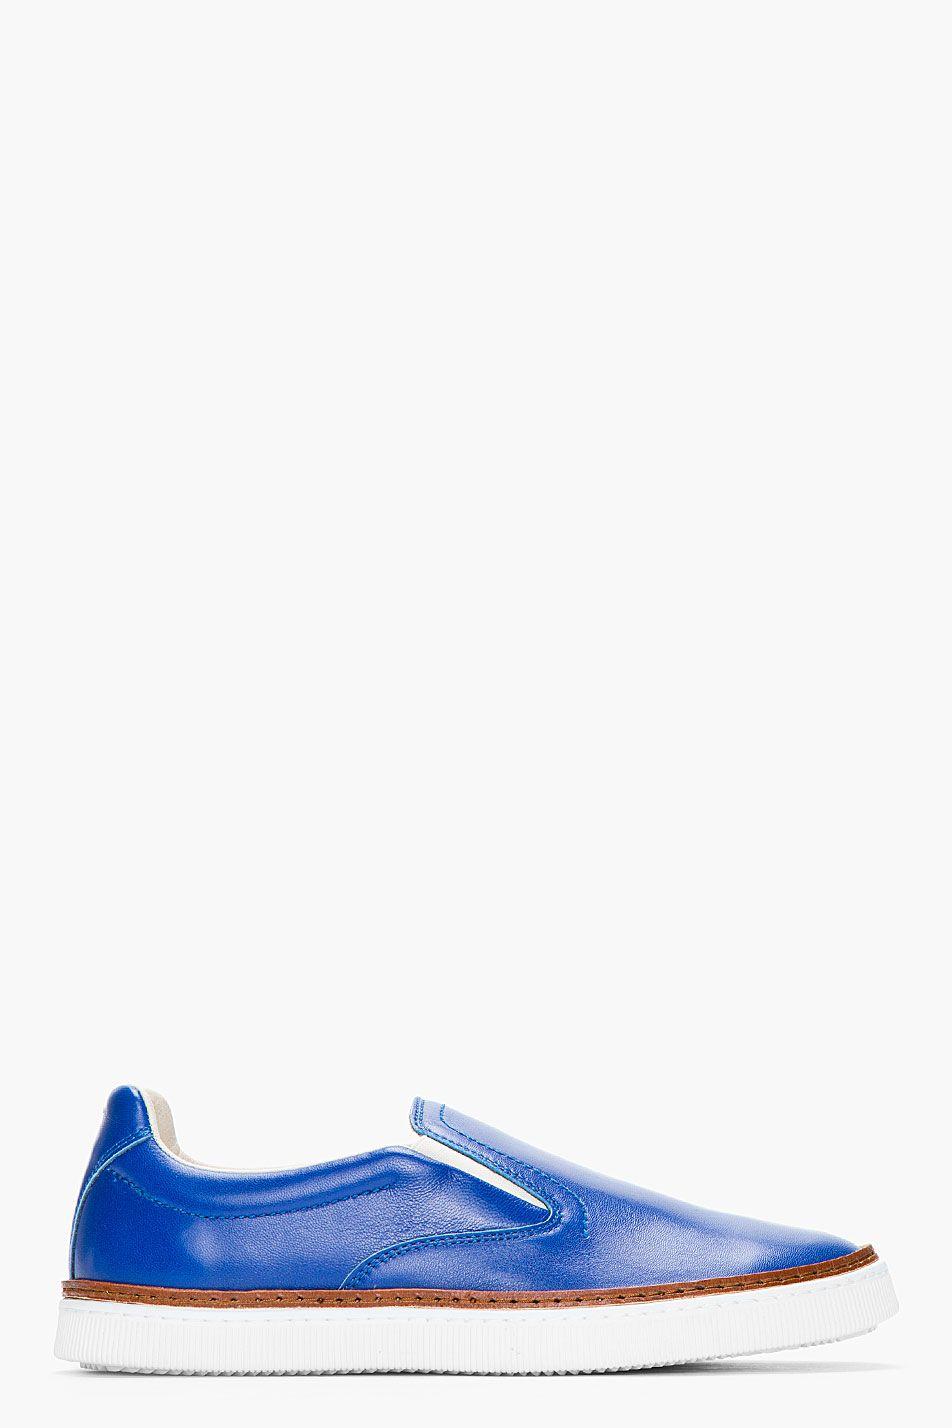 379ae089b8a MAISON MARTIN MARGIELA    Royal blue buffed leather slip-on shoes  32168M049001 Low top buffed leather slip-on shoes in royal blue. Round toe.